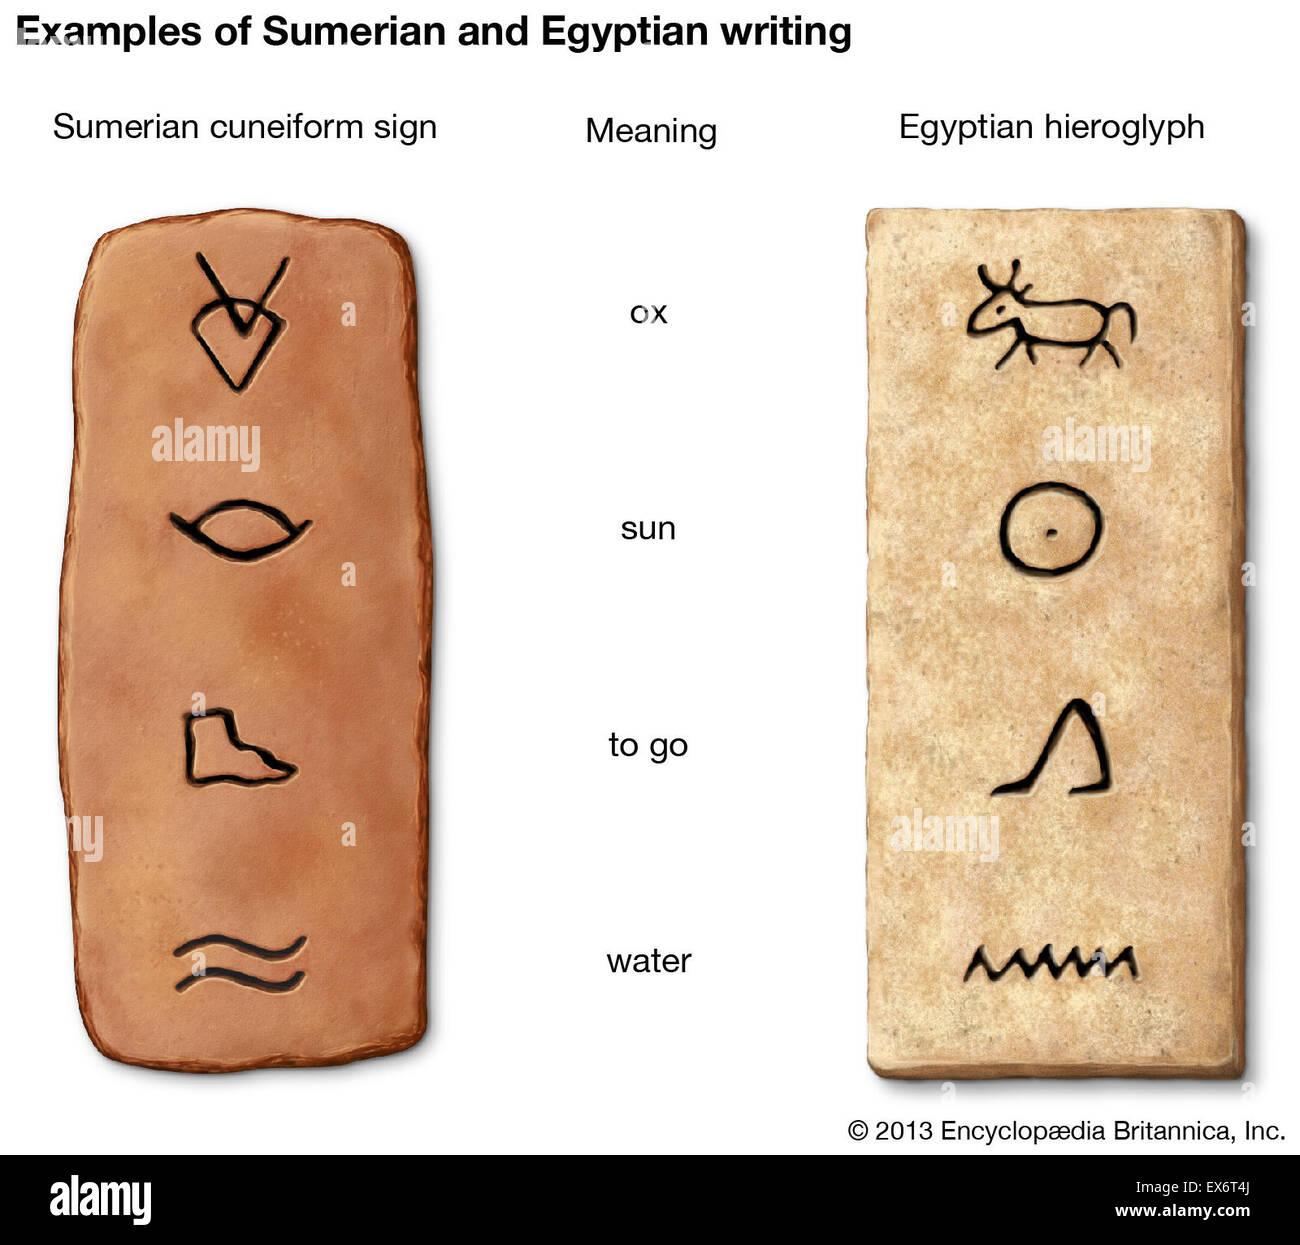 Sumerian Cuneiform Writing Stock Photos Sumerian Cuneiform Writing